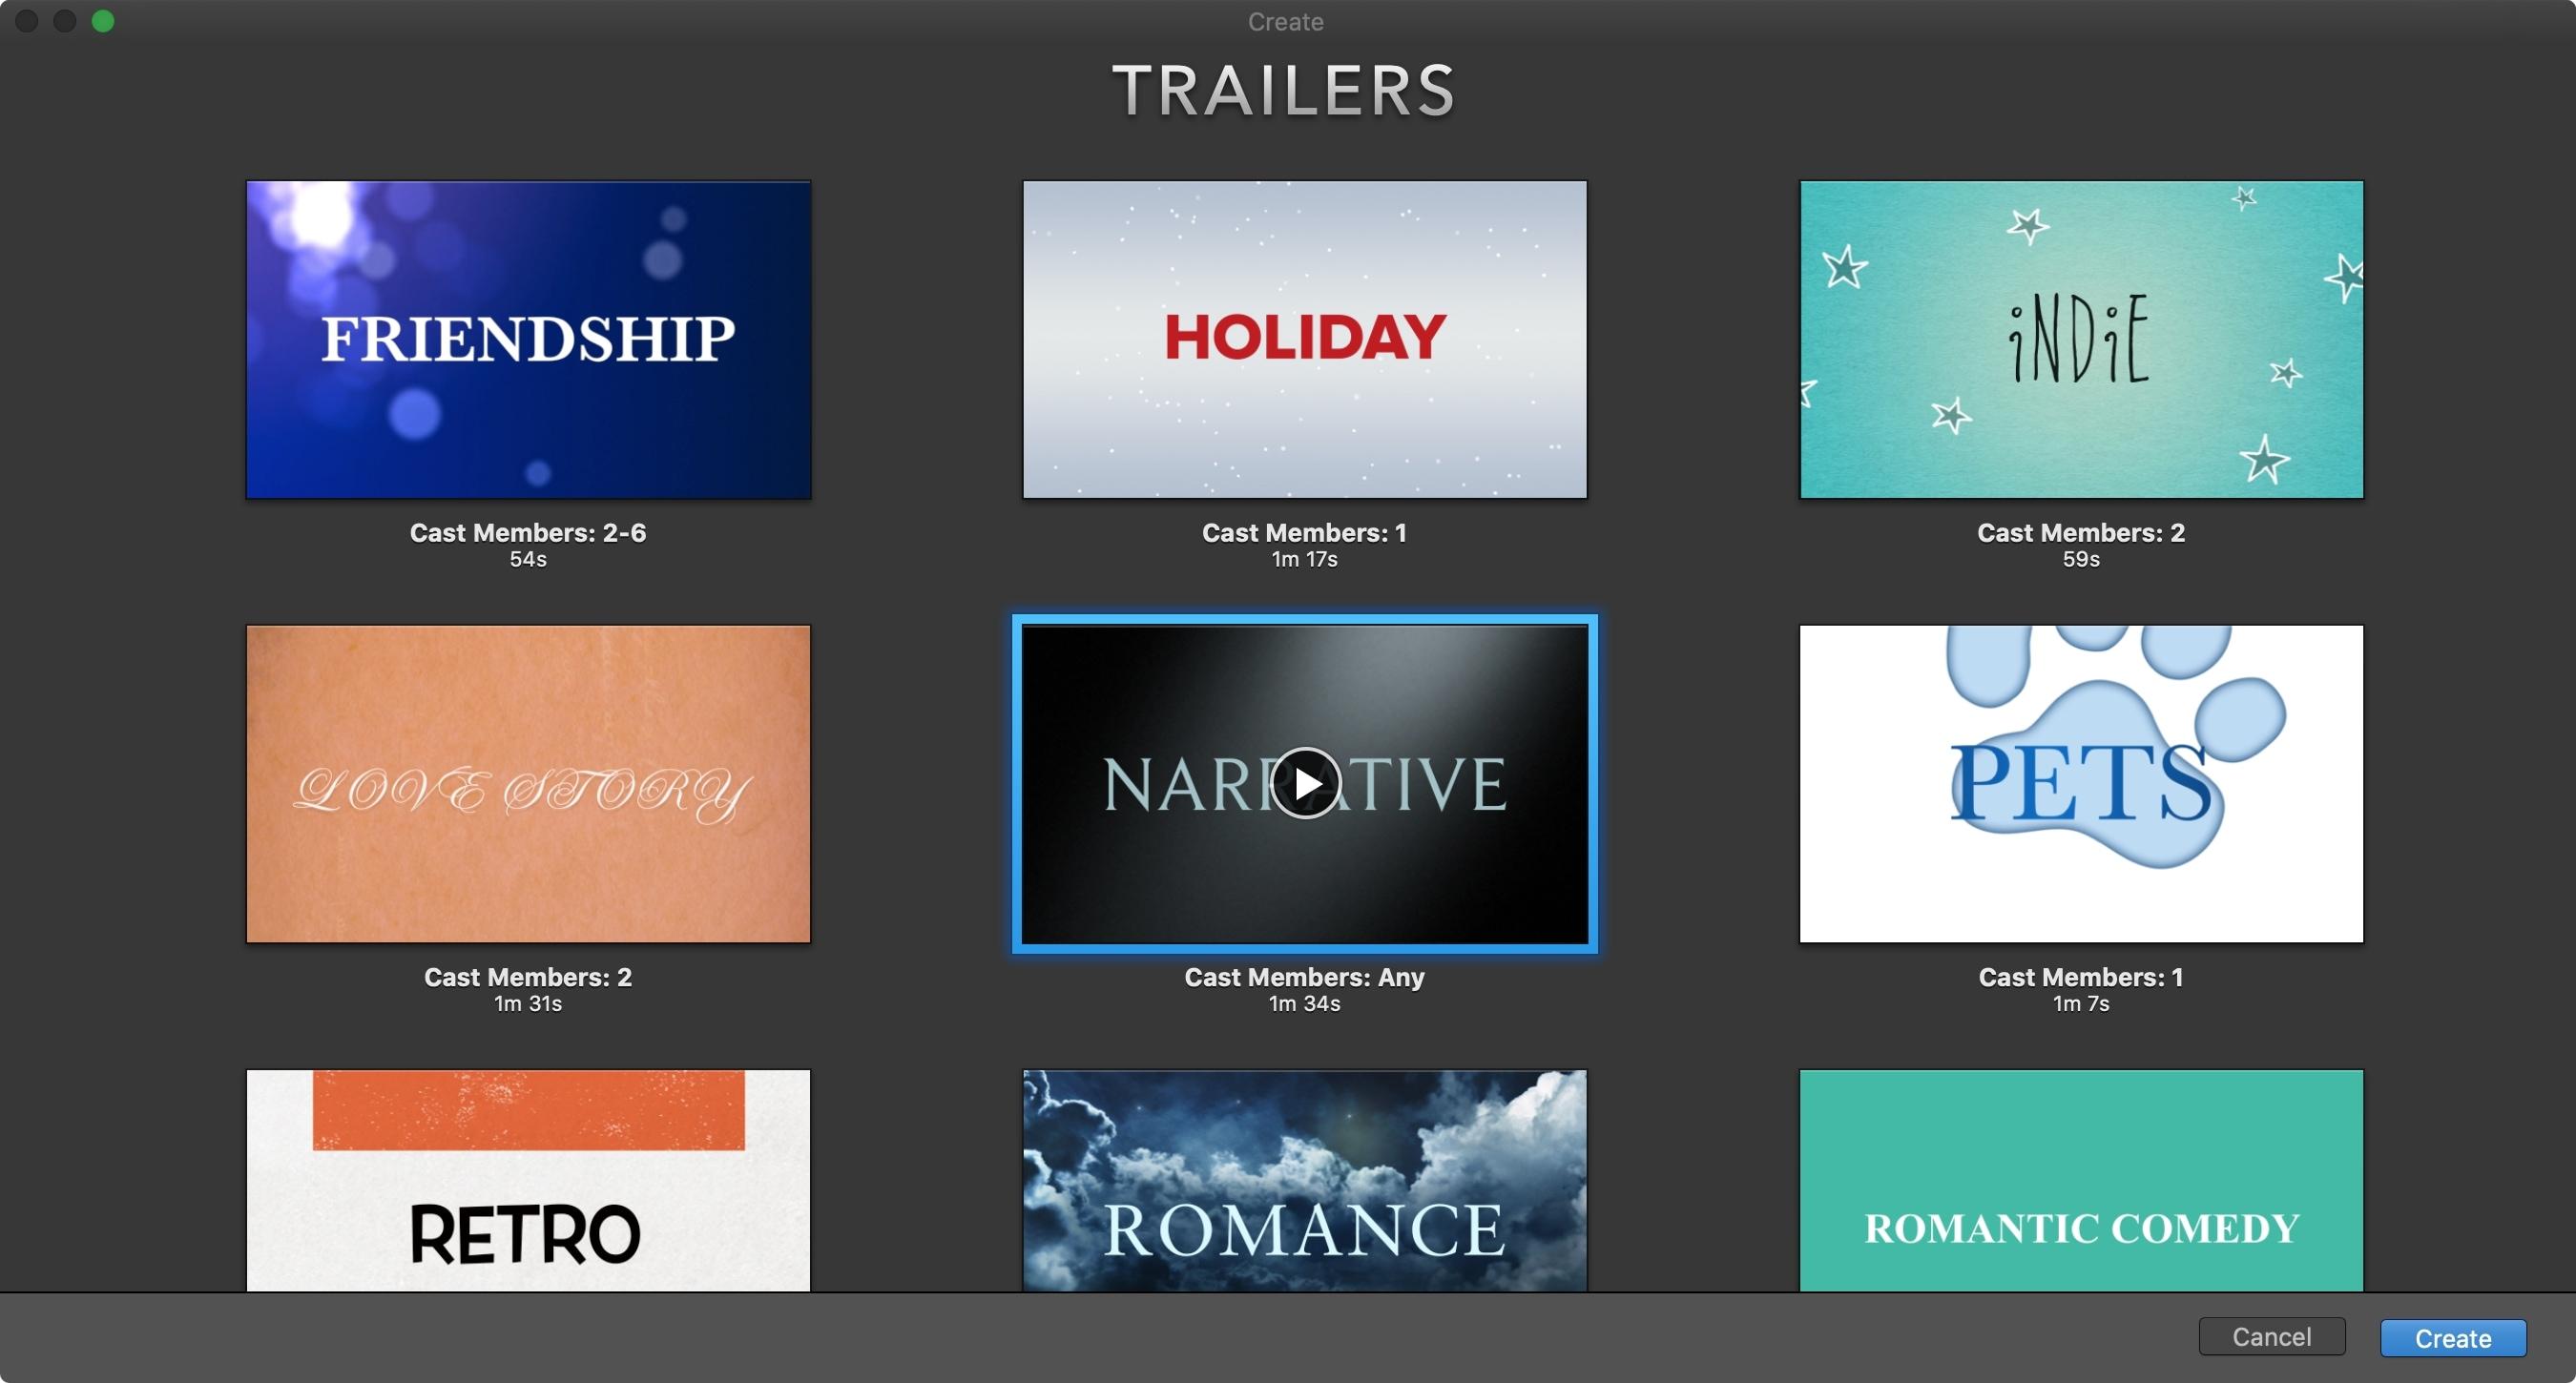 Criar novo trailer iMovie Mac